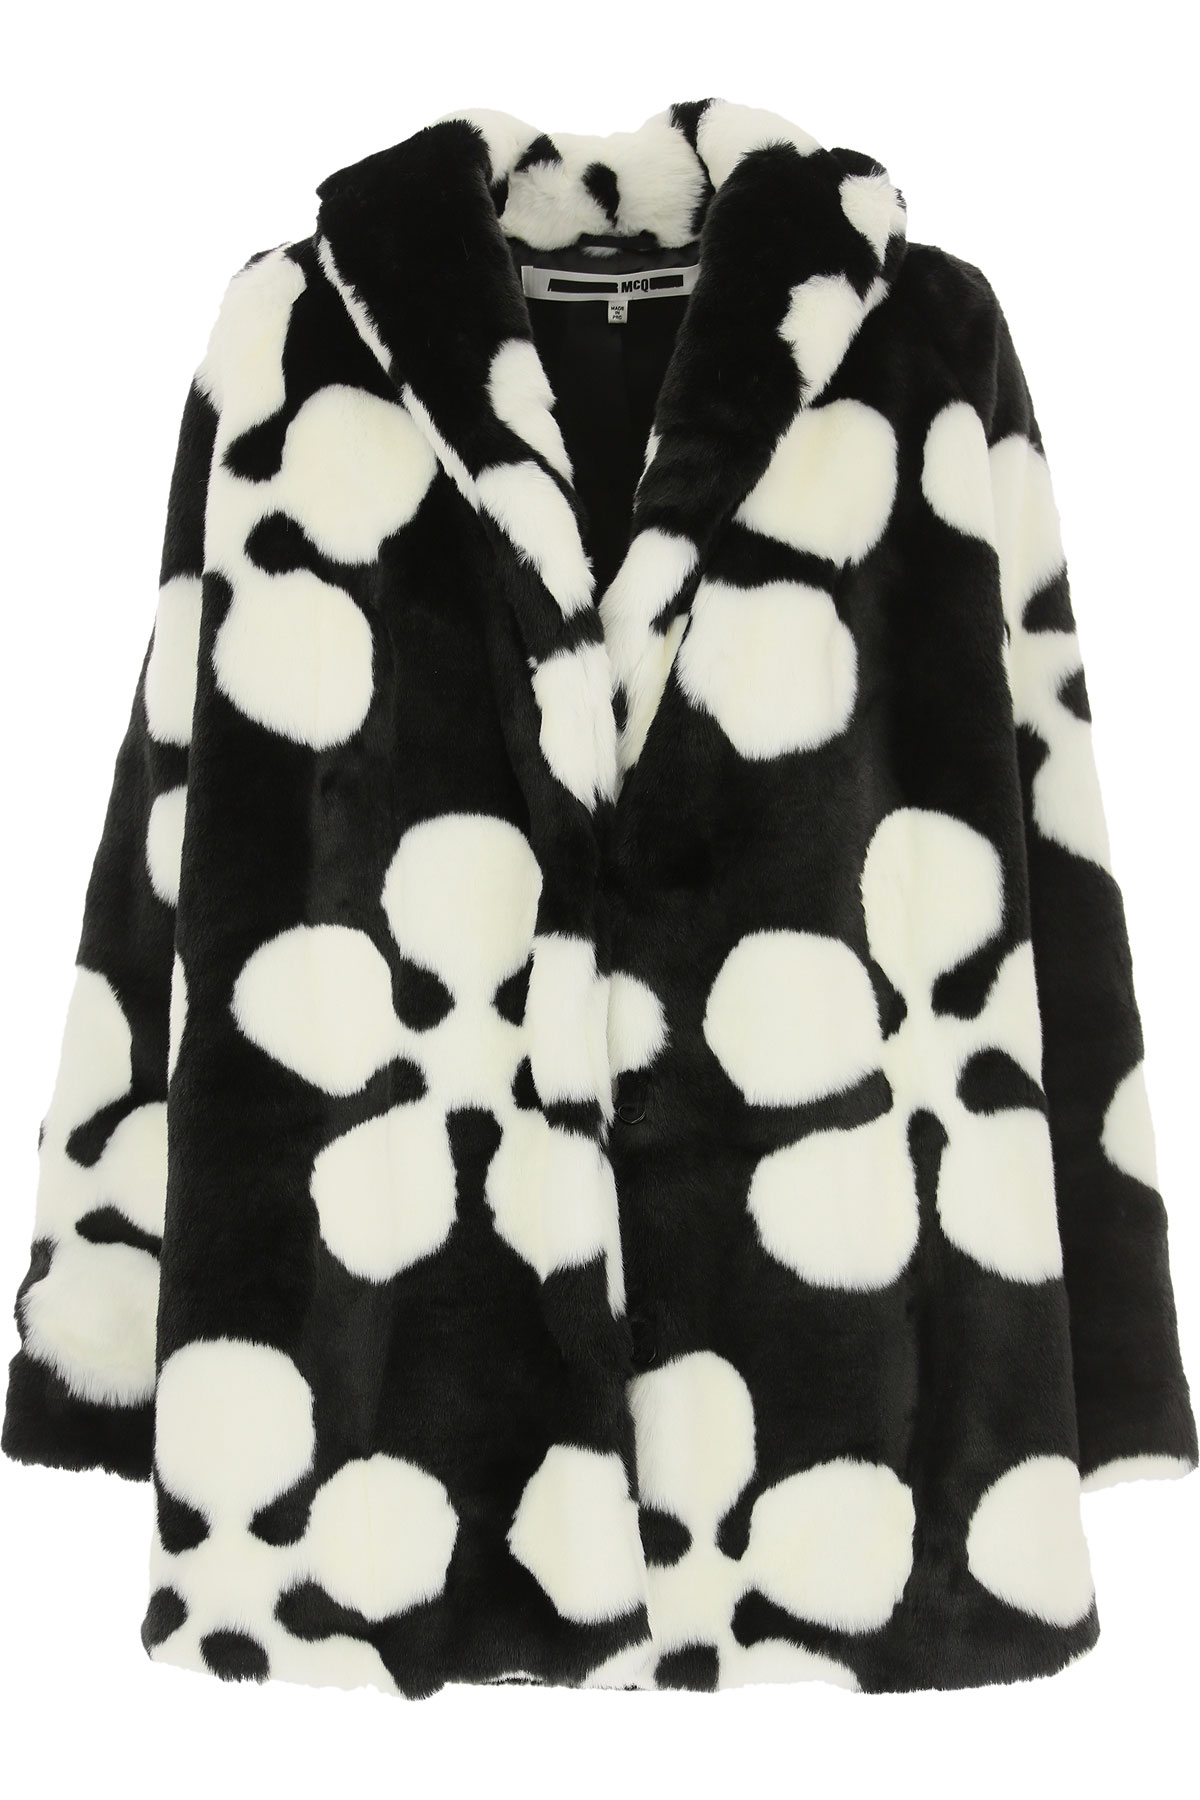 Alexander McQueen McQ Down Jacket for Women, Puffer Ski Jacket On Sale, Black, modacrylic, 2019, 4 6 8